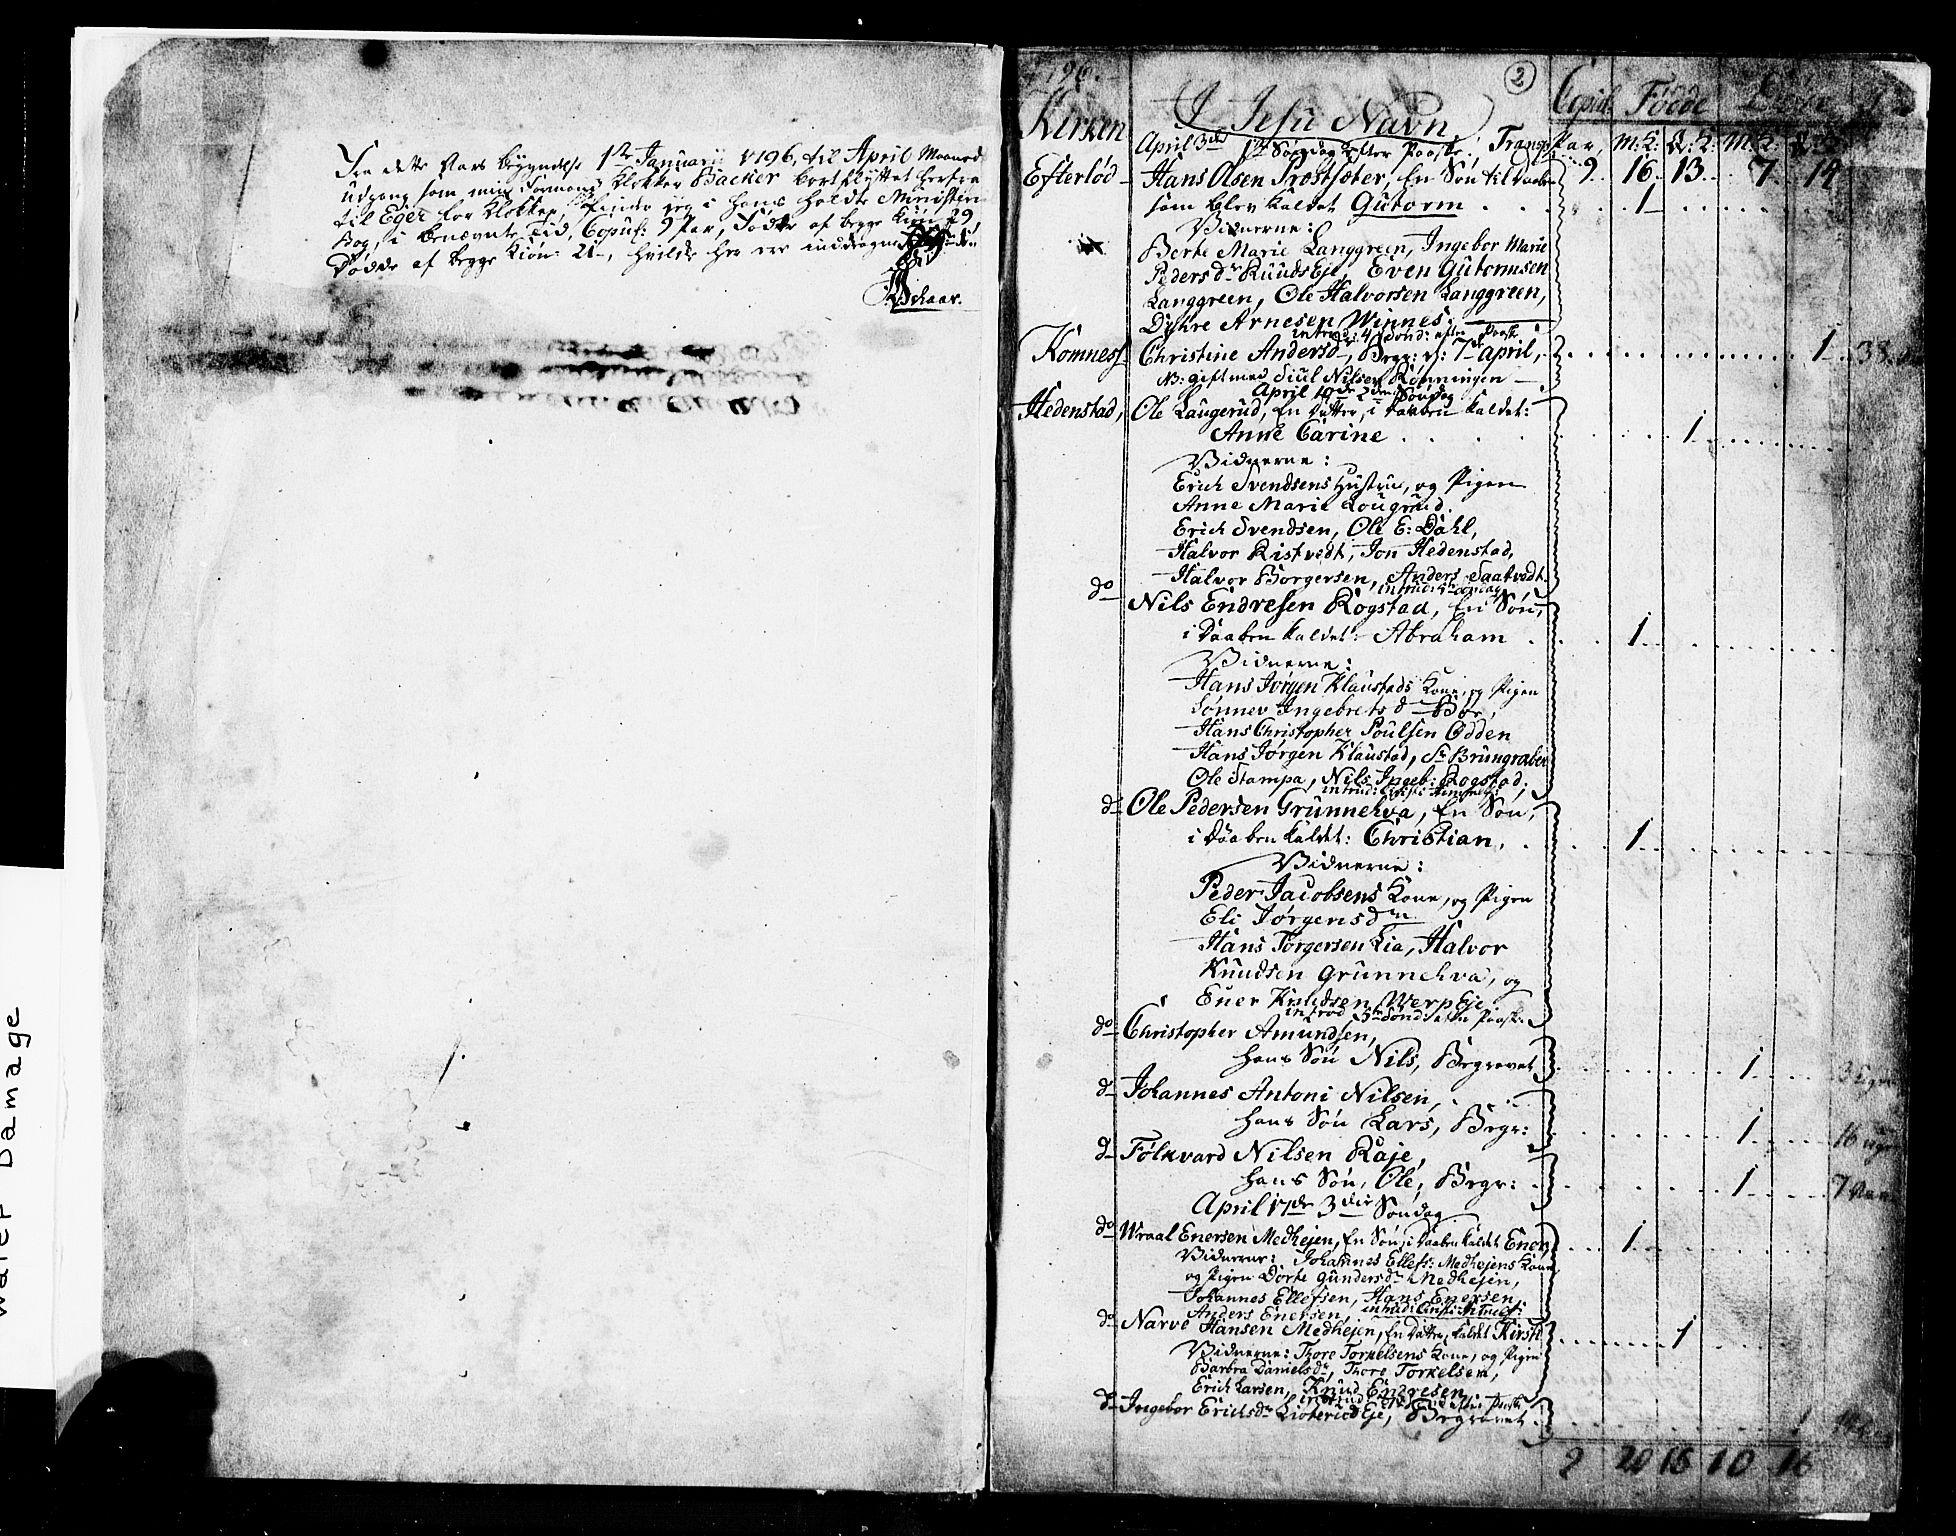 SAKO, Sandsvær kirkebøker, G/Ga/L0002: Klokkerbok nr. I 2, 1796-1817, s. 2